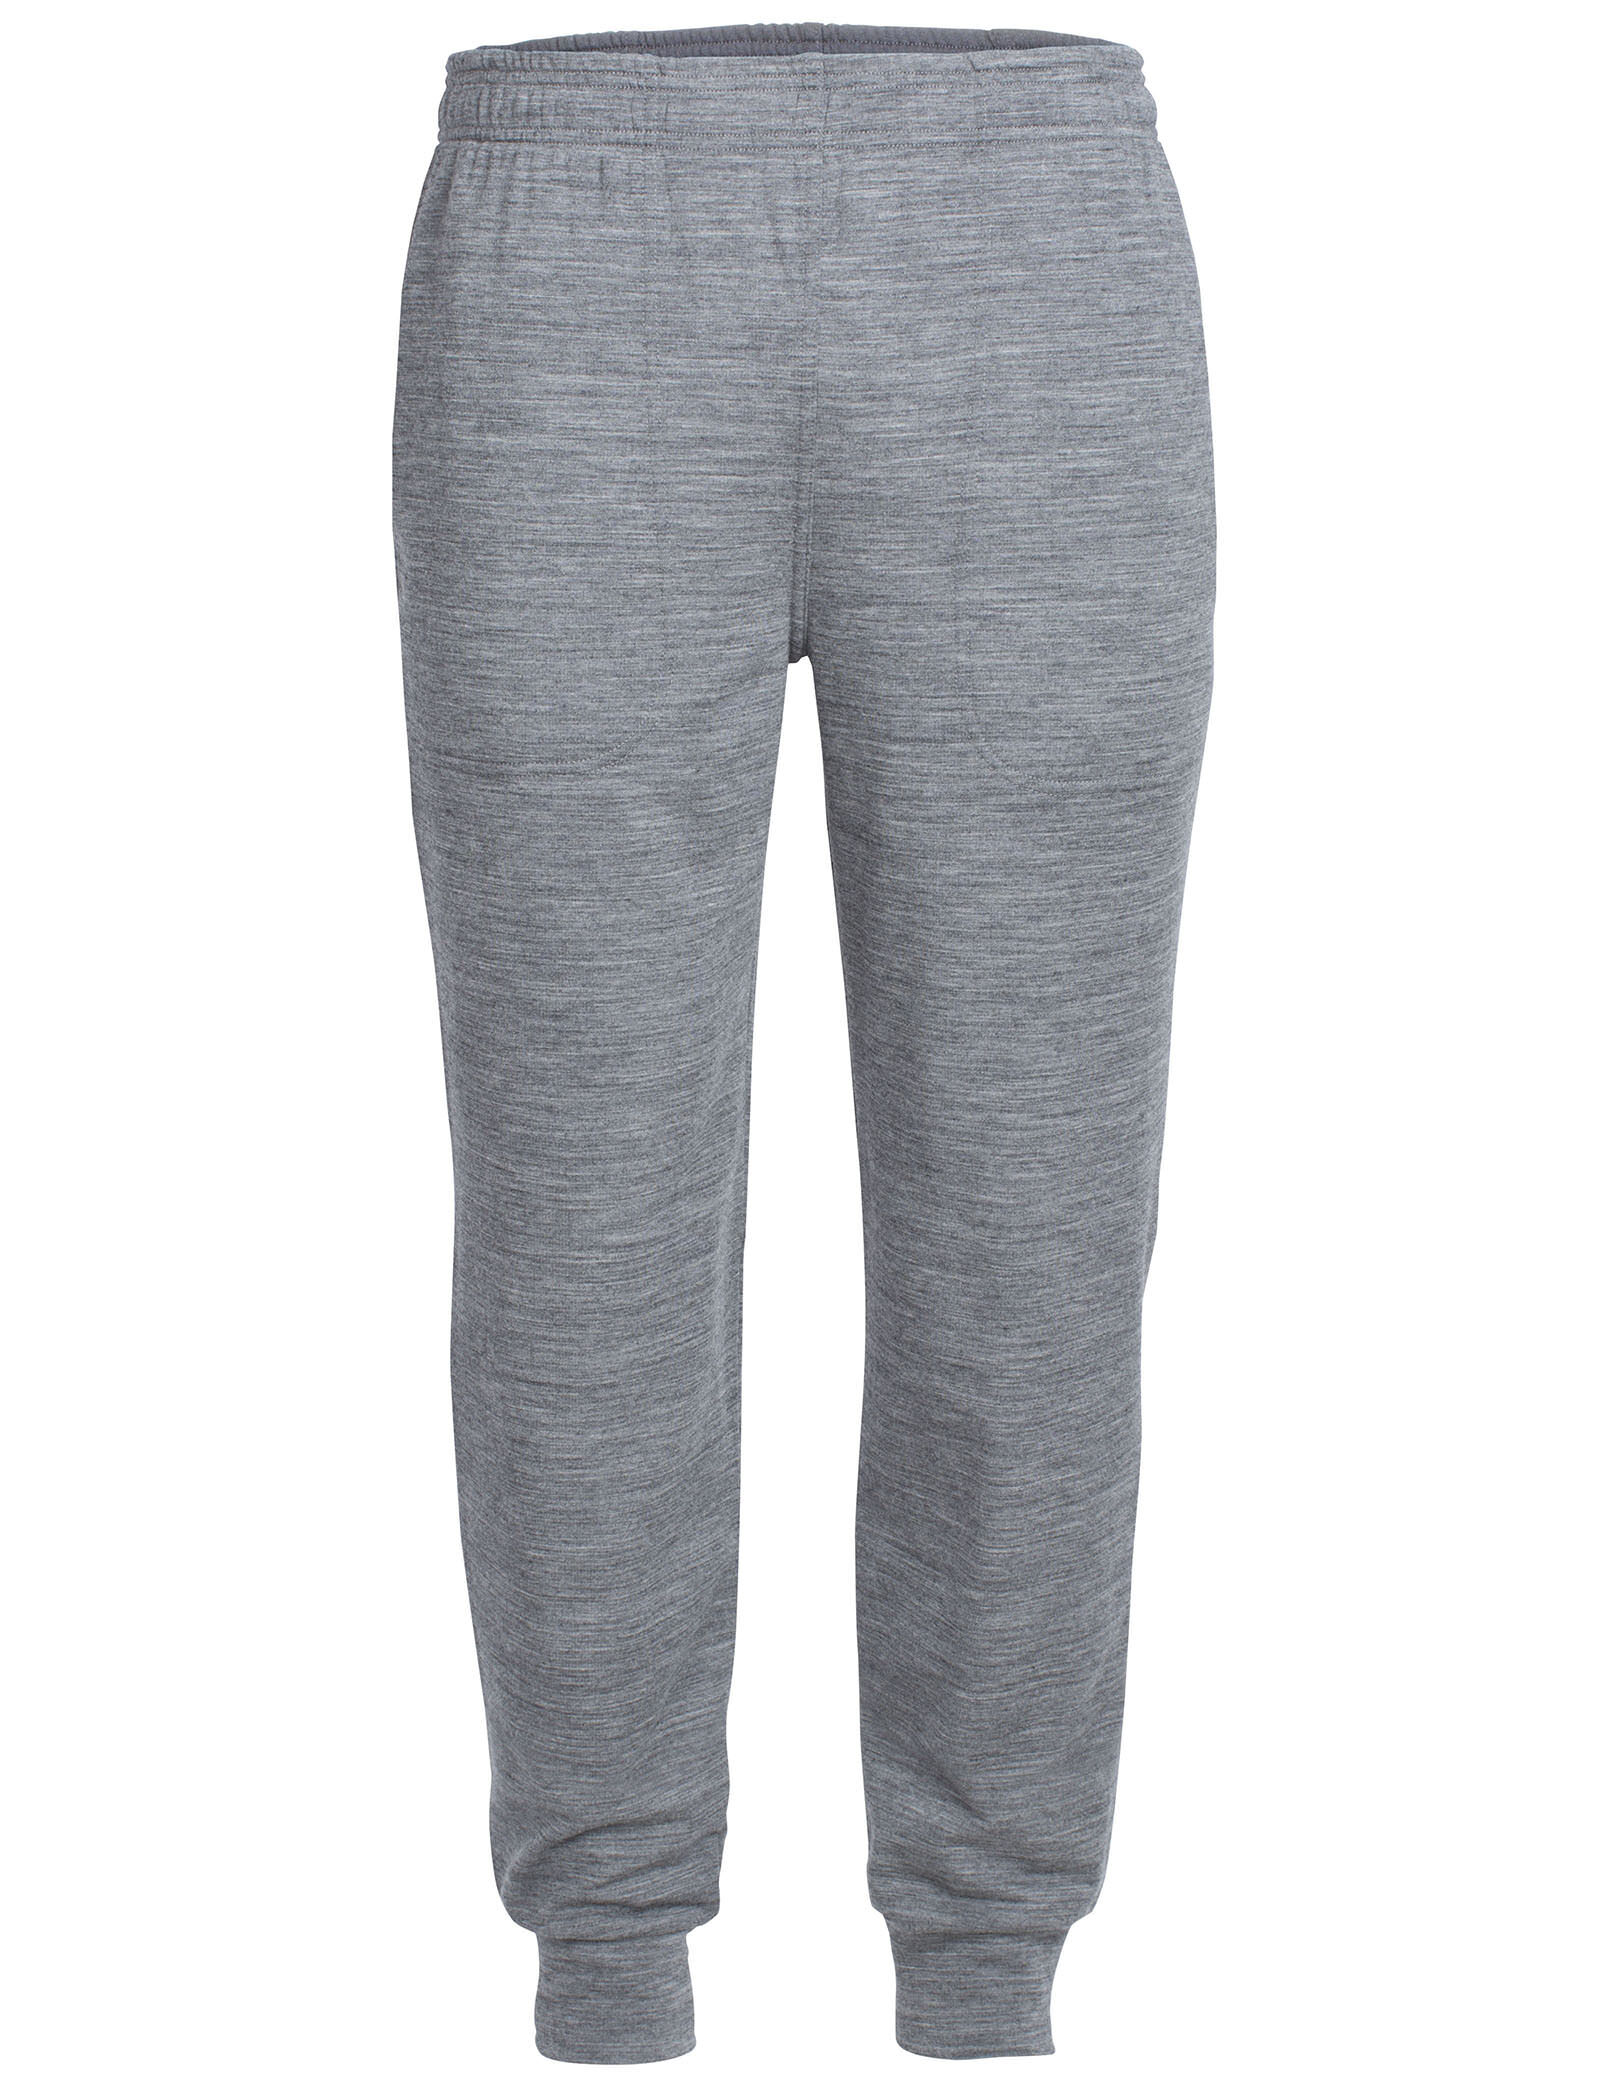 M ESSENTIAL CUFF Pants natural Merino Mens Medium Essential Cuff Trousers Jogging Bottoms Men super